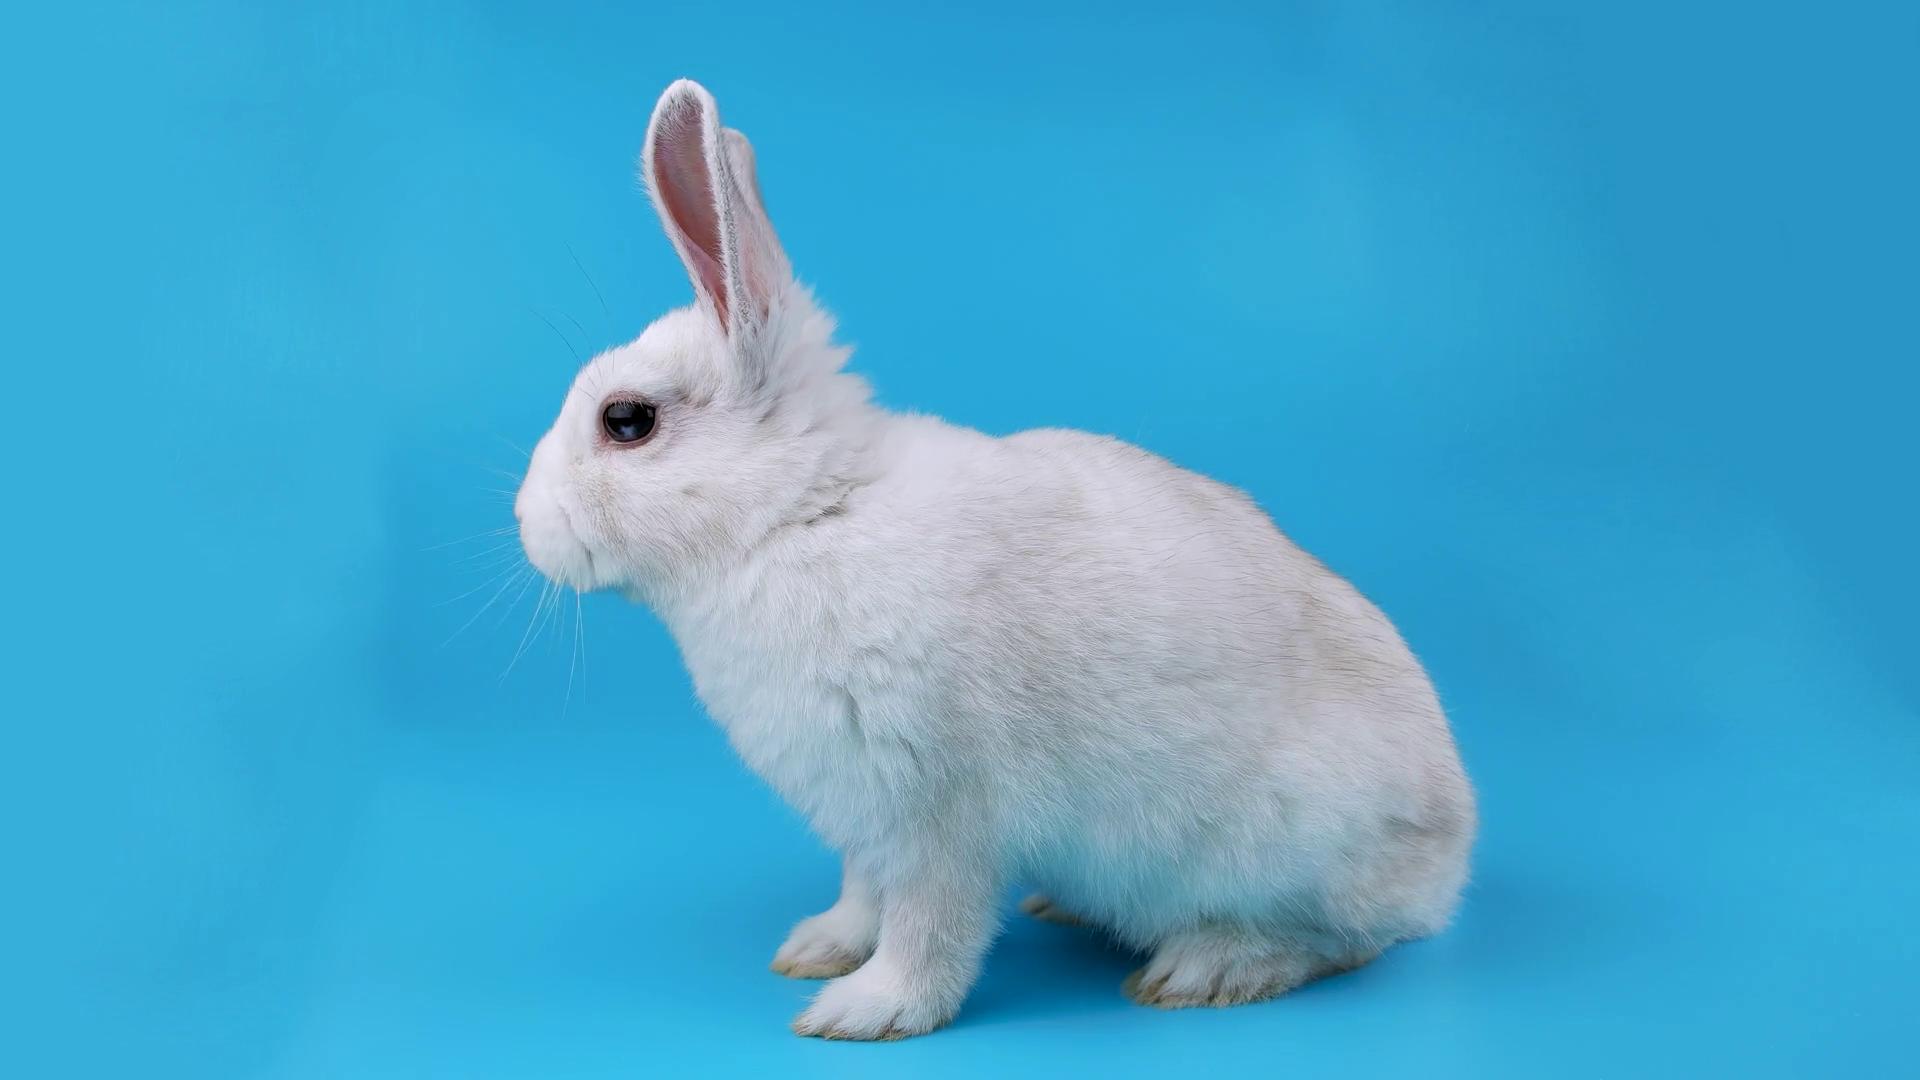 Easter rabbit sideways photo